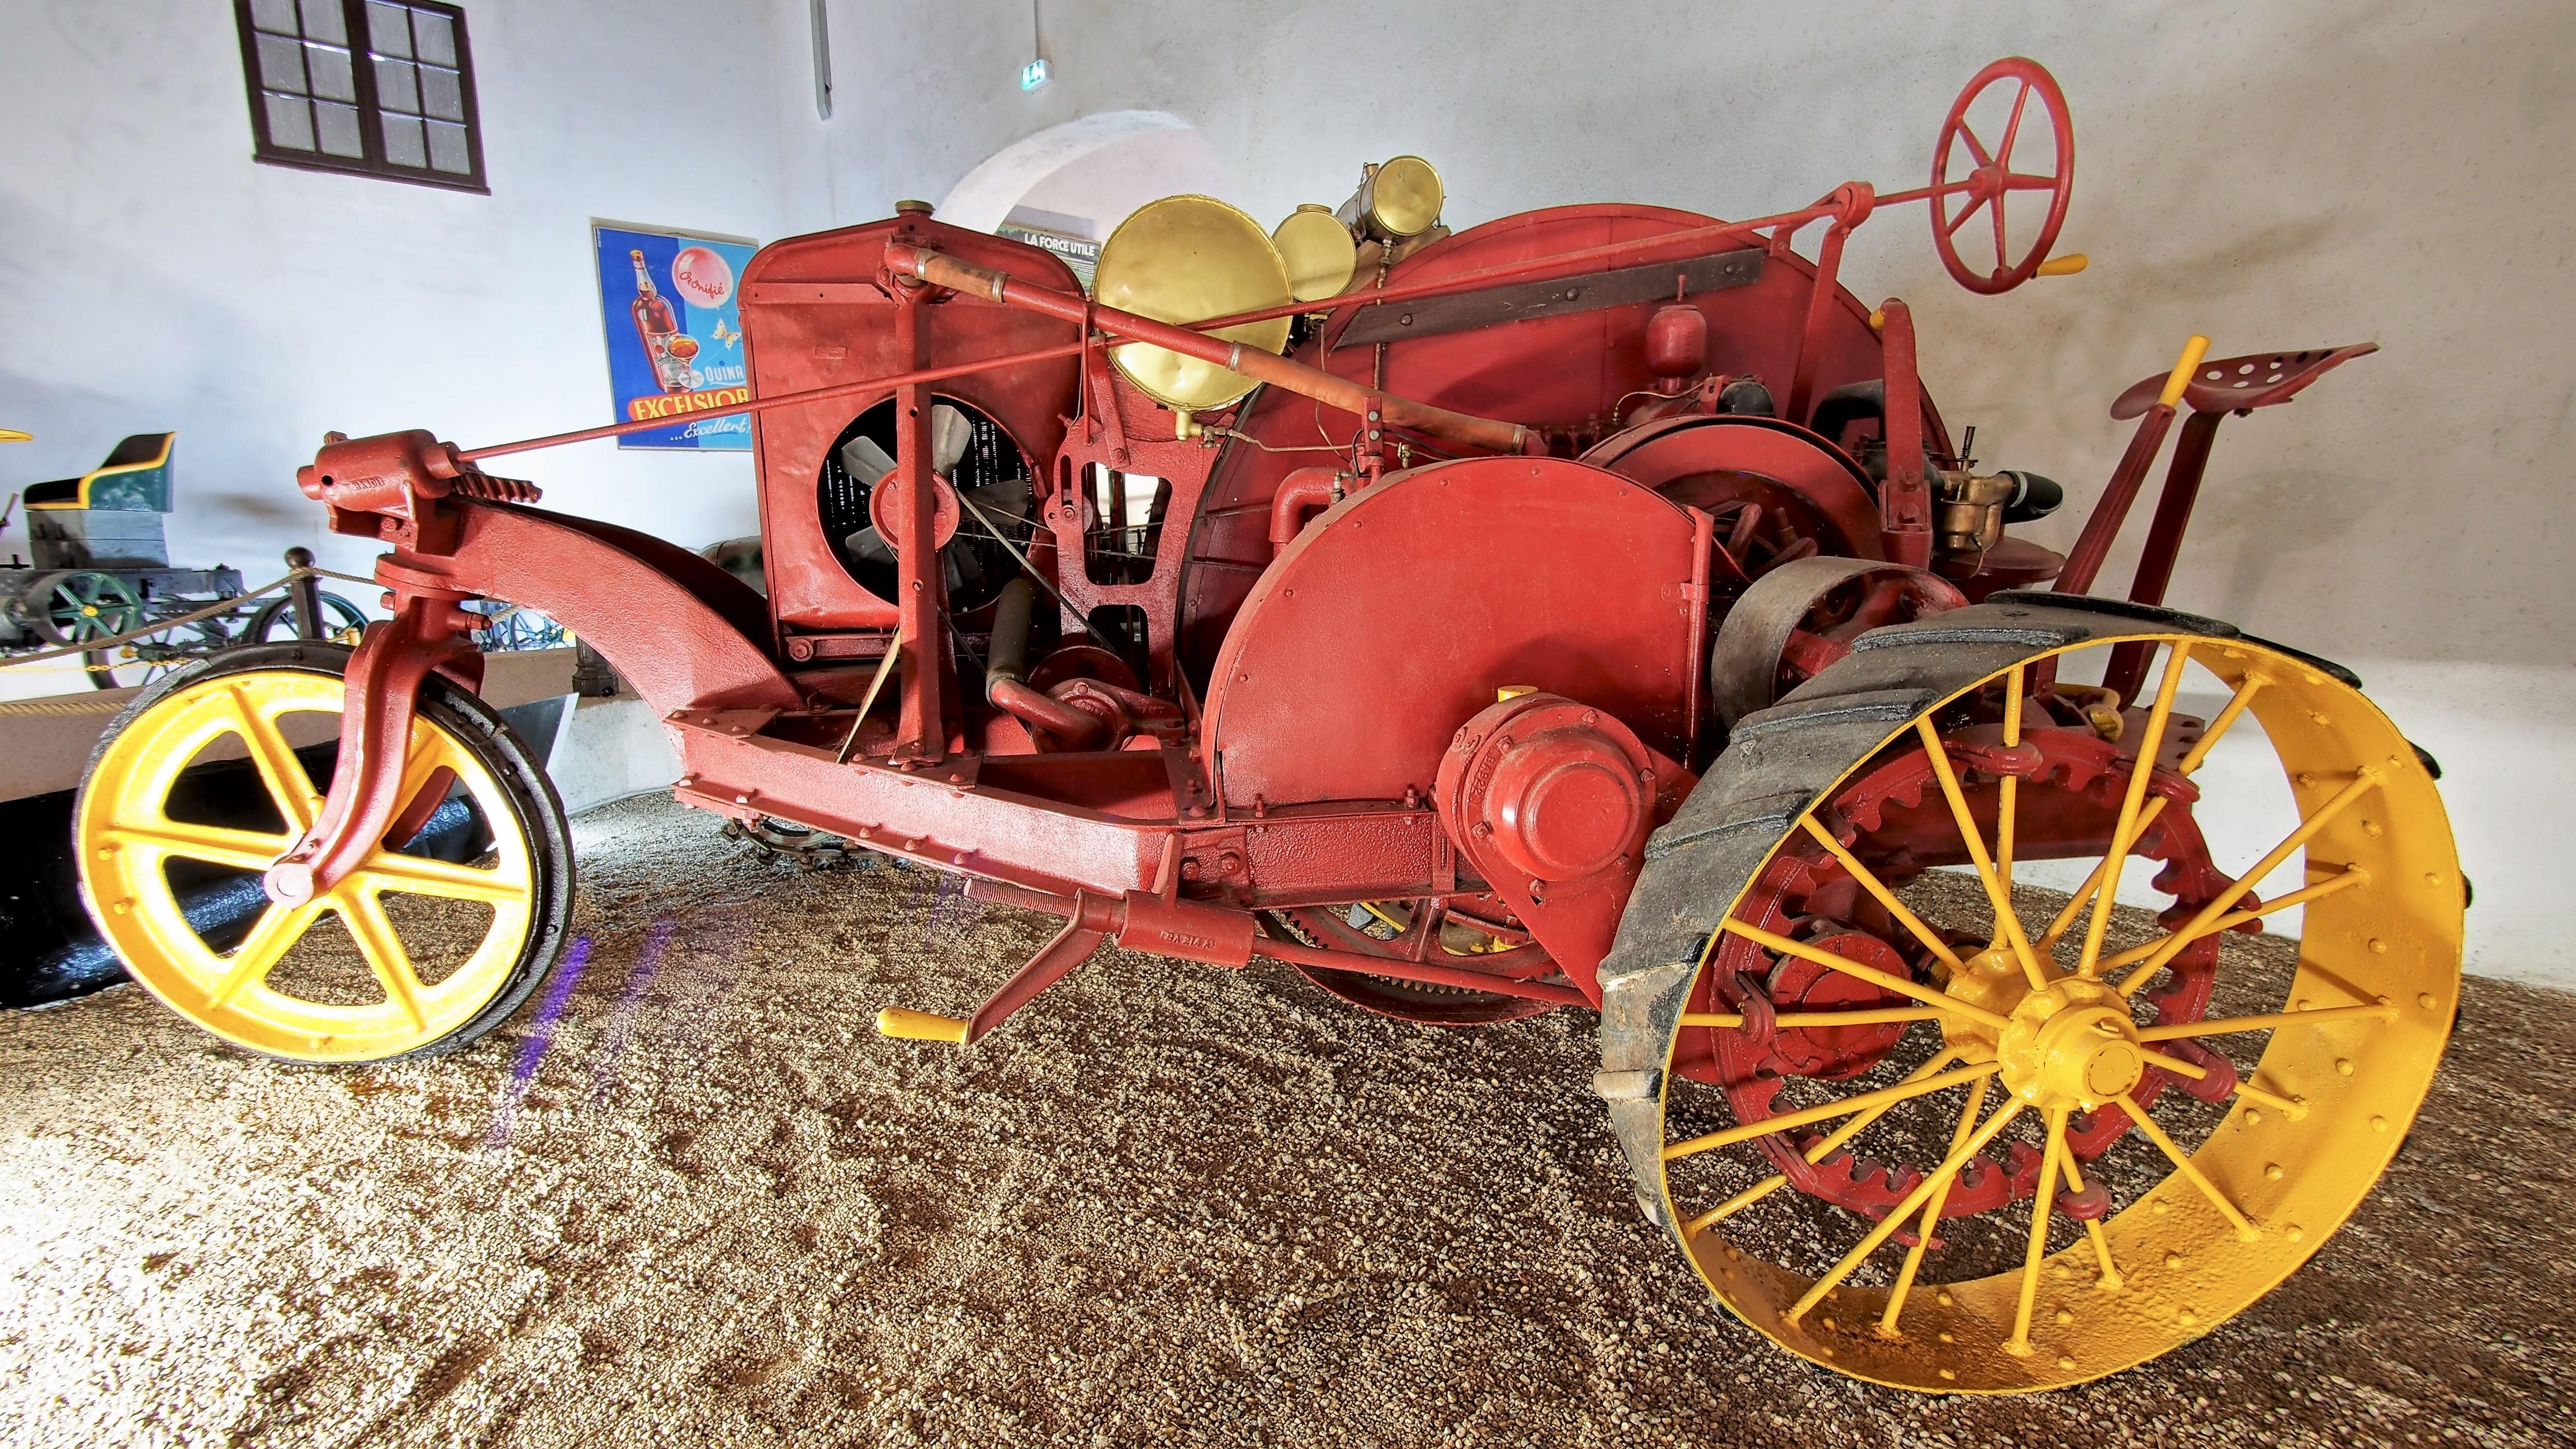 Datei:1914 tracteur Big-Bull, Musée Maurice Dufresne photo 7.jpg ...